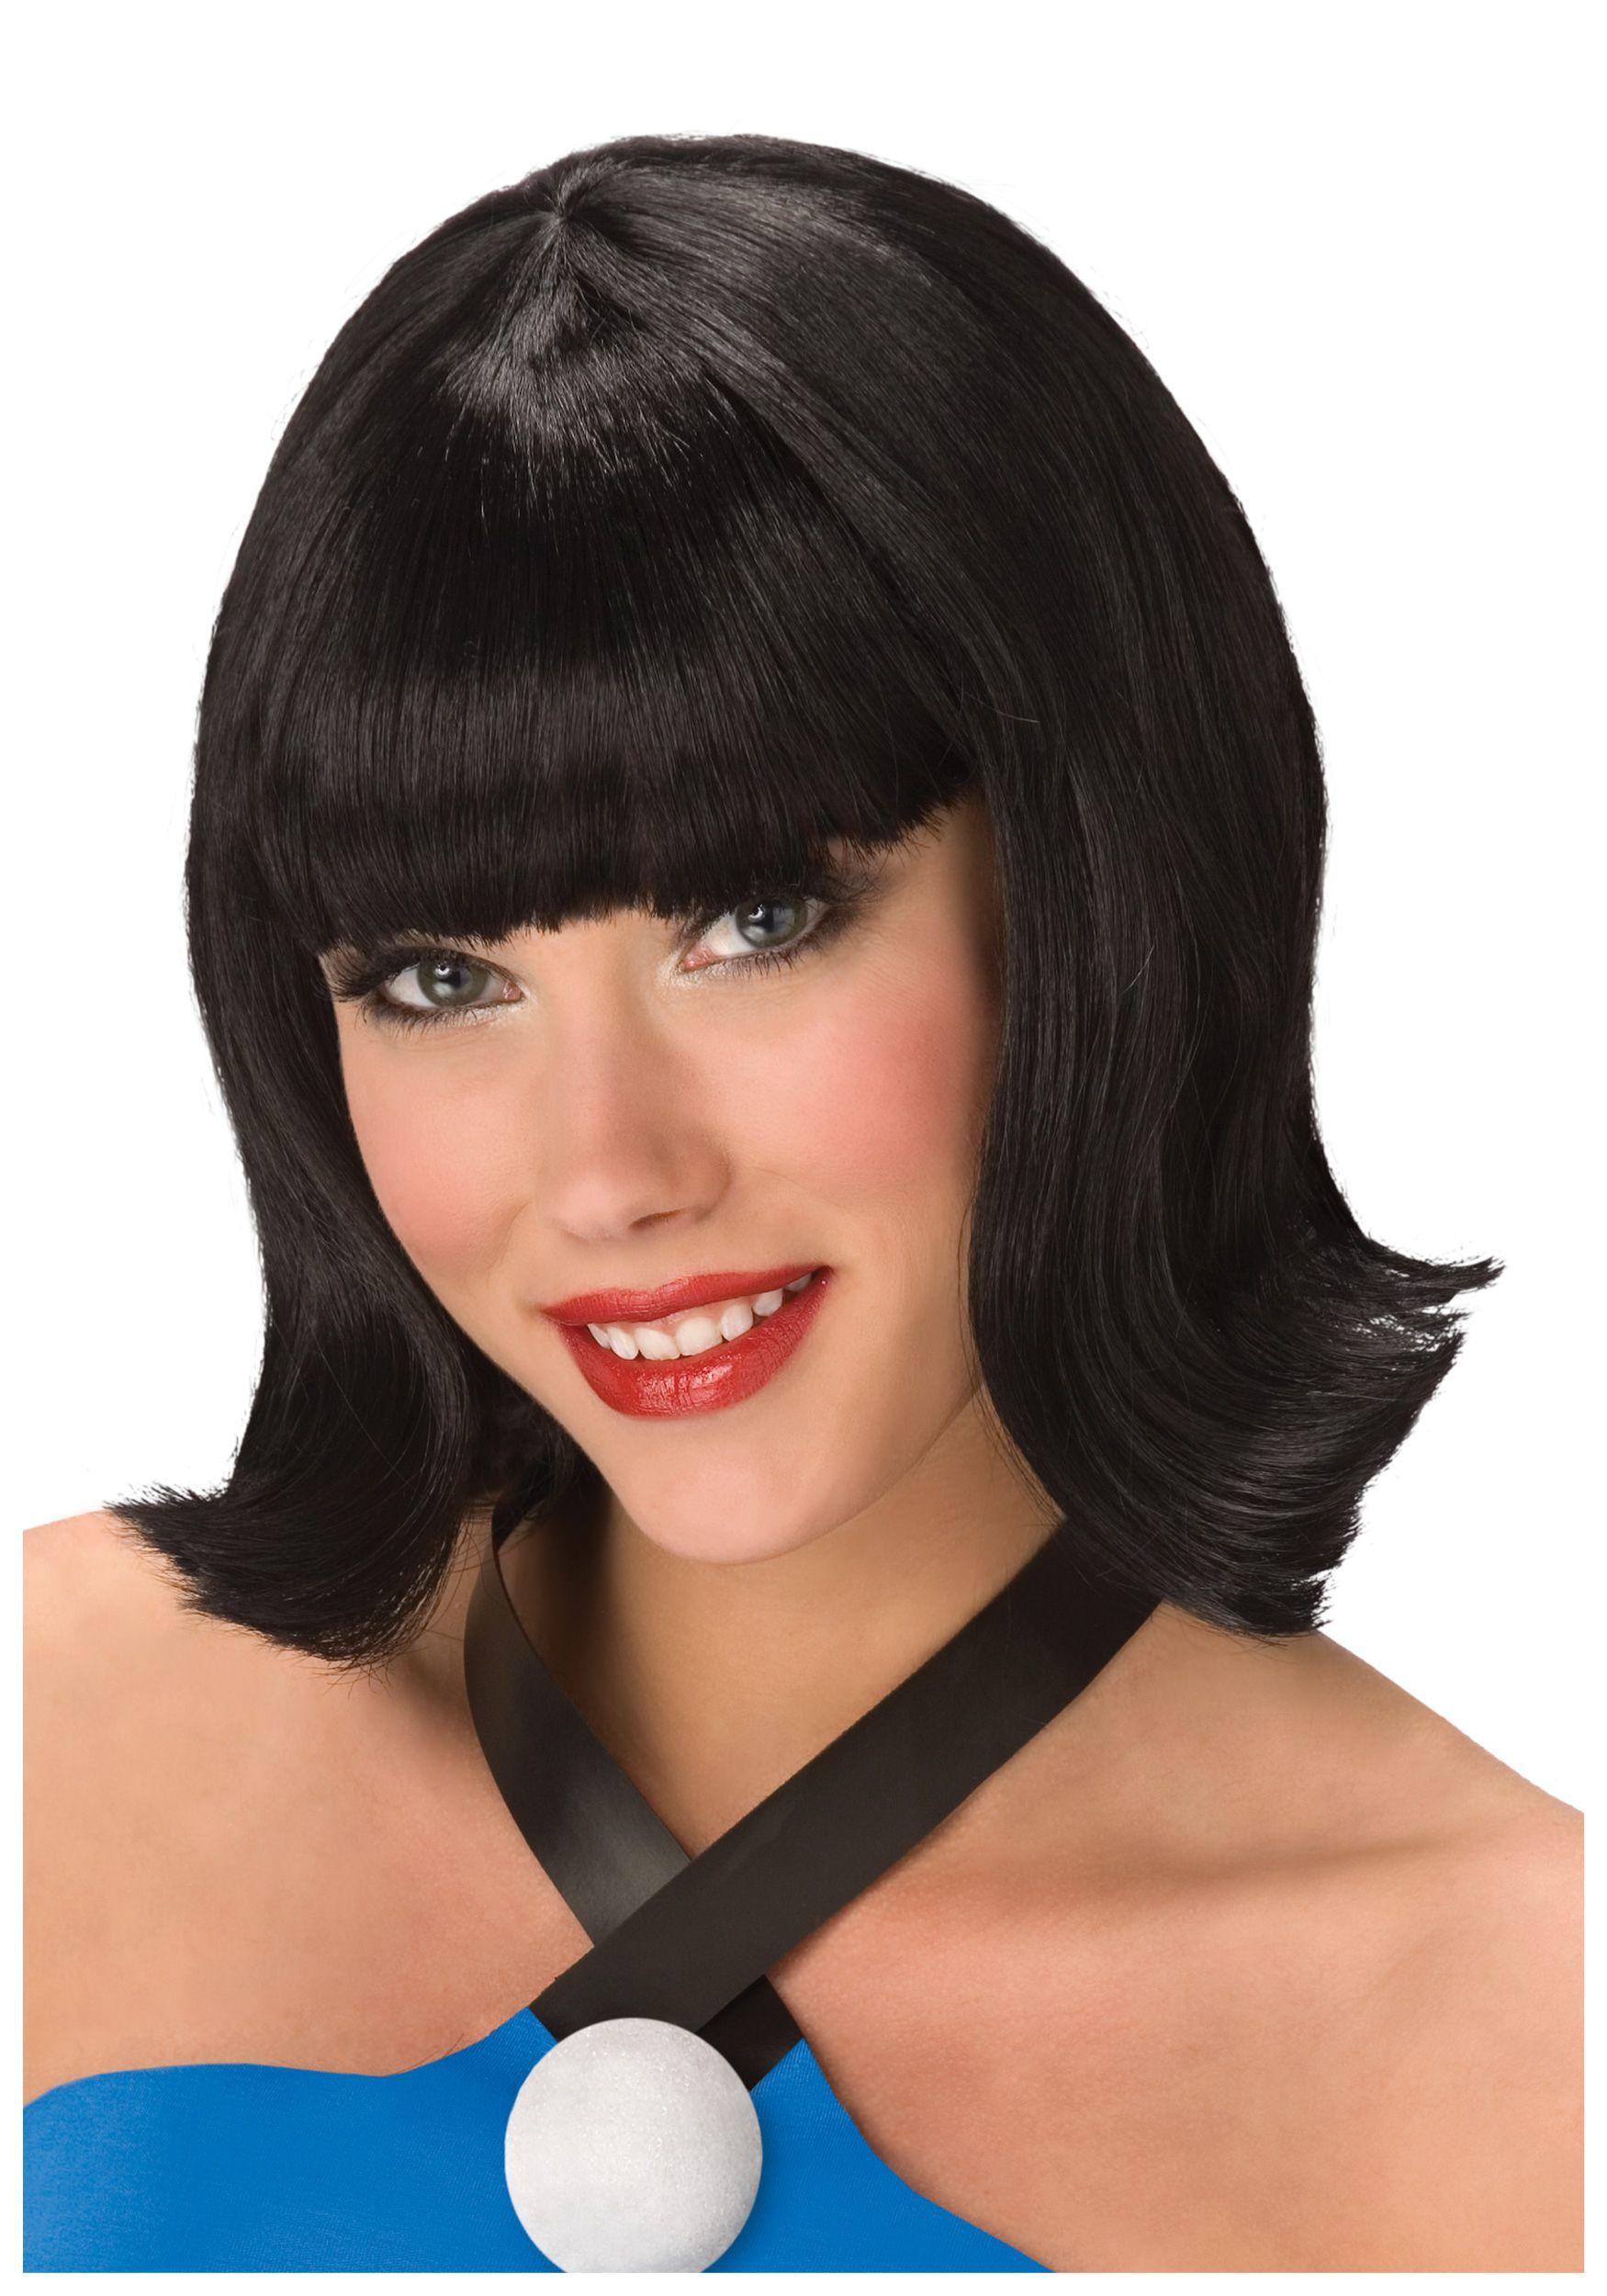 Deluxe Cavewoman Neighbor Wig Betty Rubble Betty Rubble Costume Medium Length Hair Styles